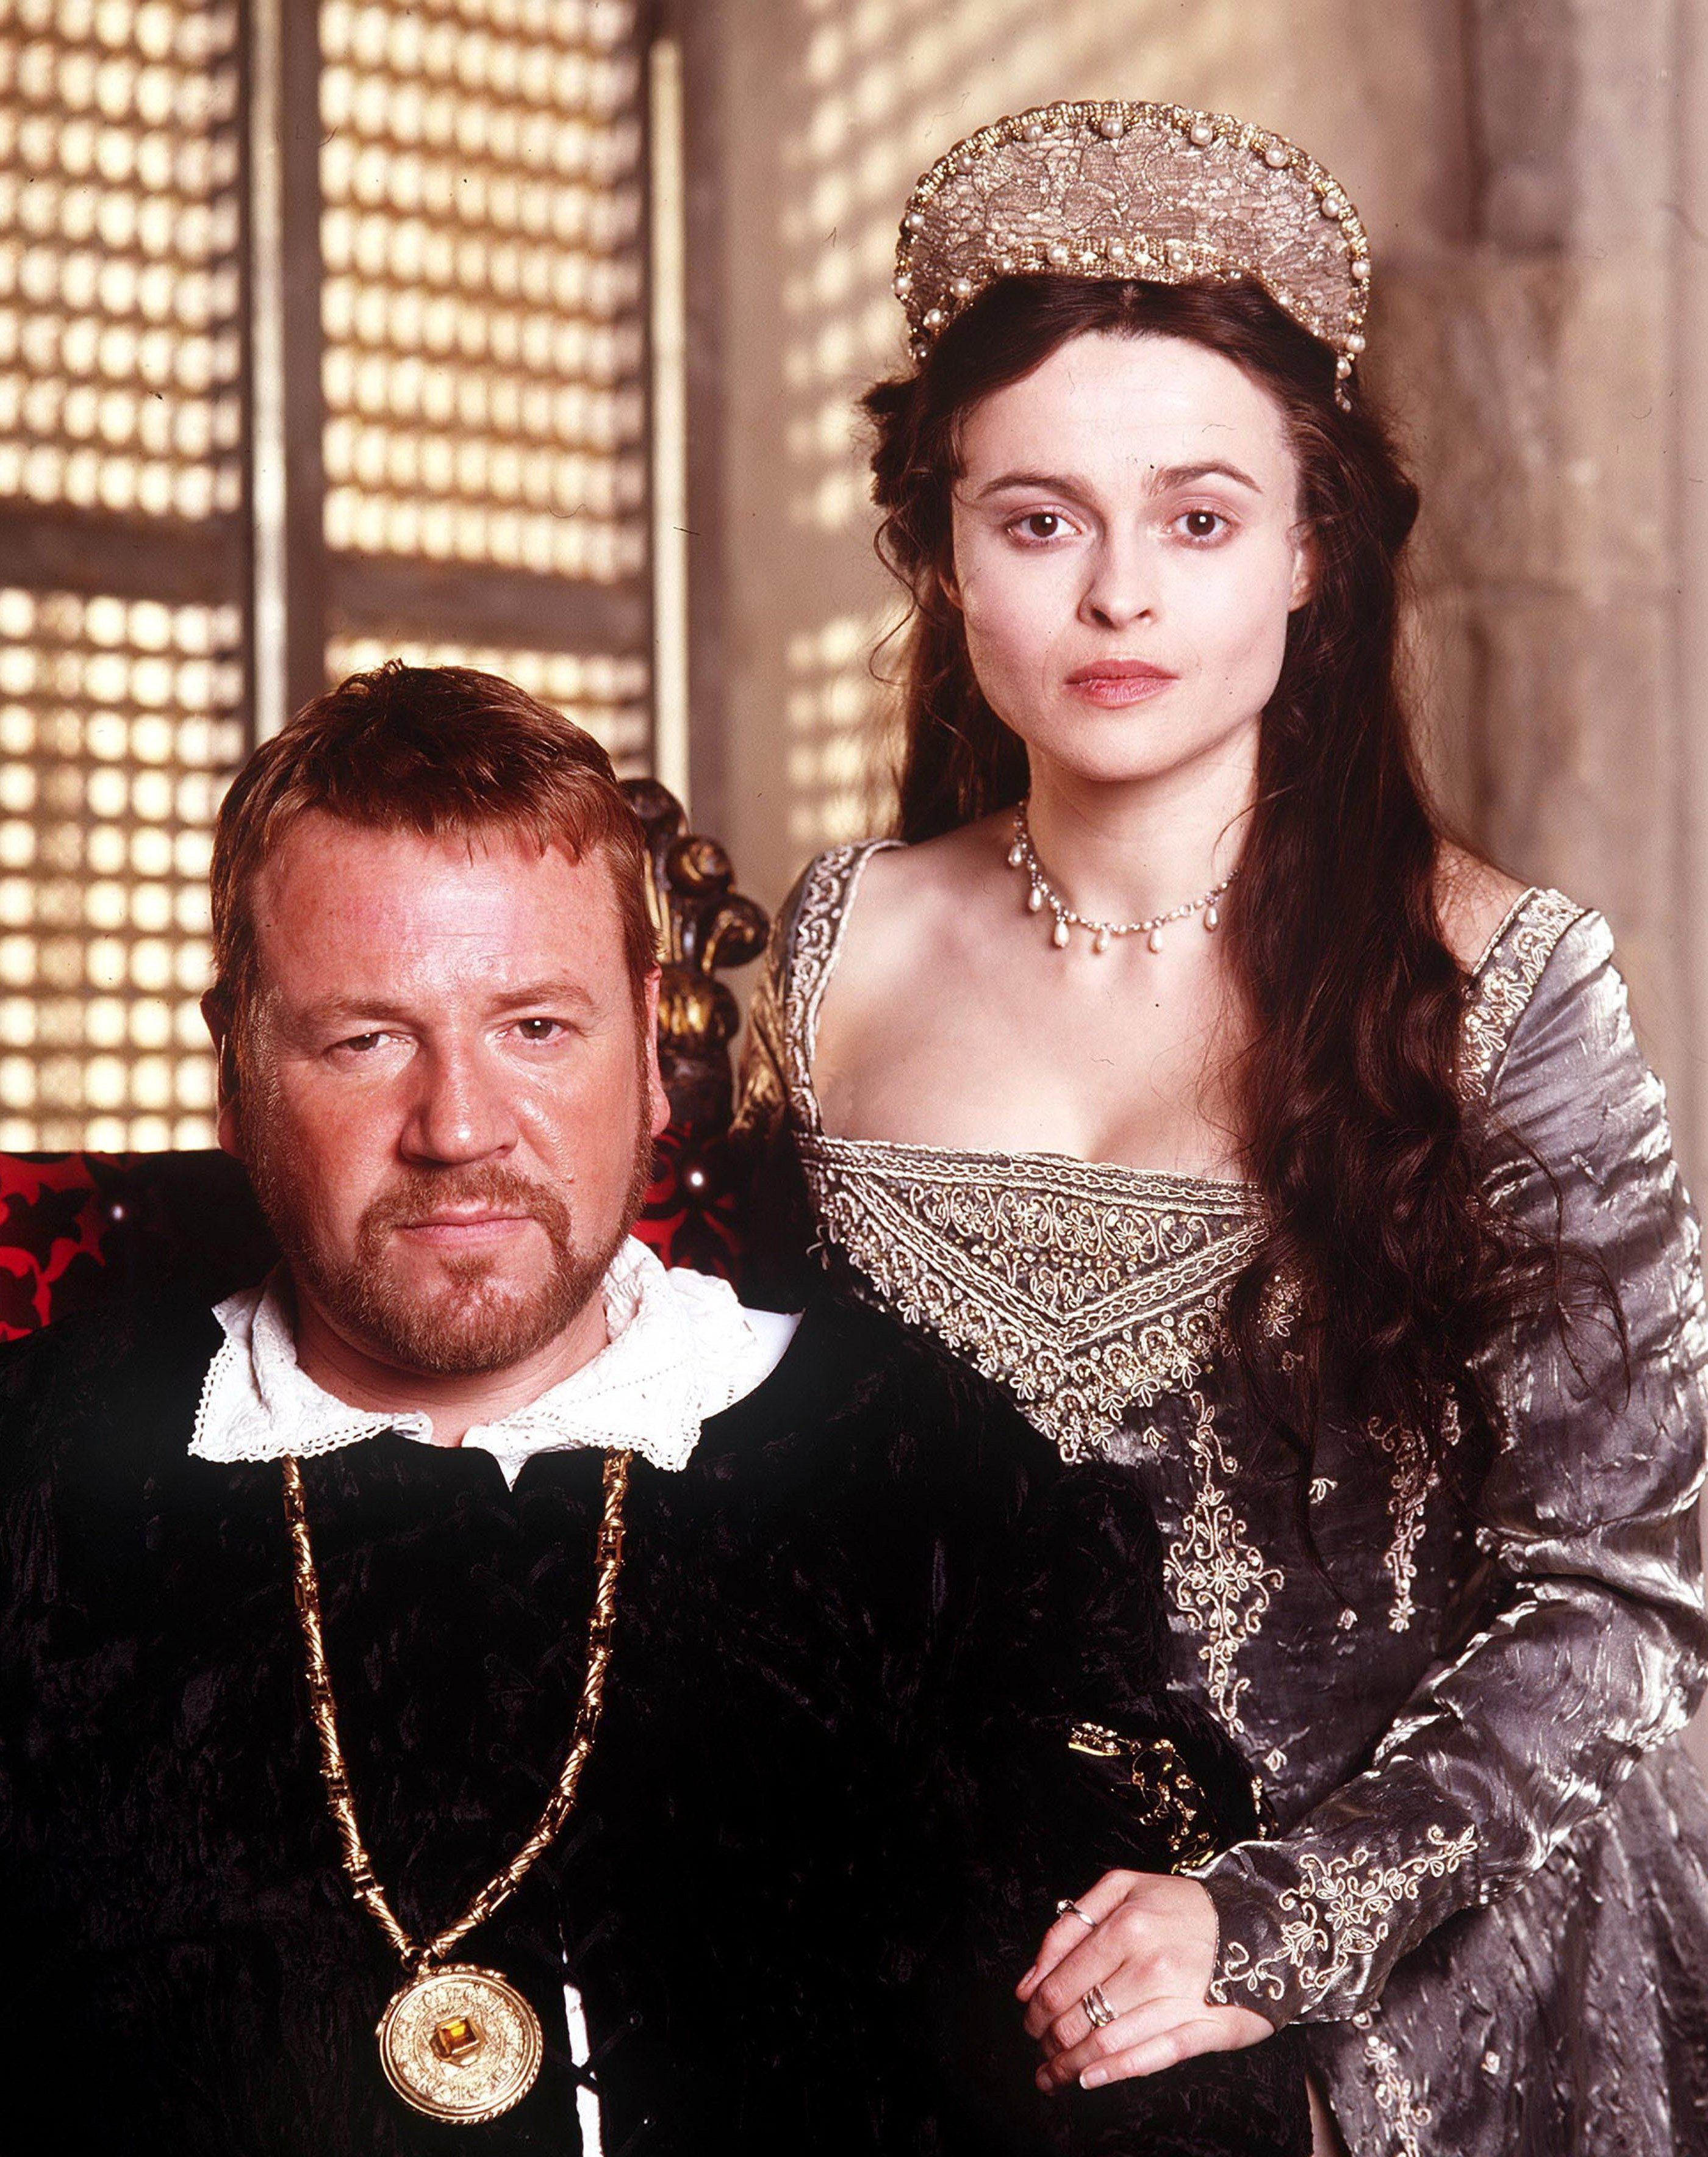 The Other Boleyn Girl Hd Wallpaper Helena Bonham Carter Henry Viii Promo Helena Bonham